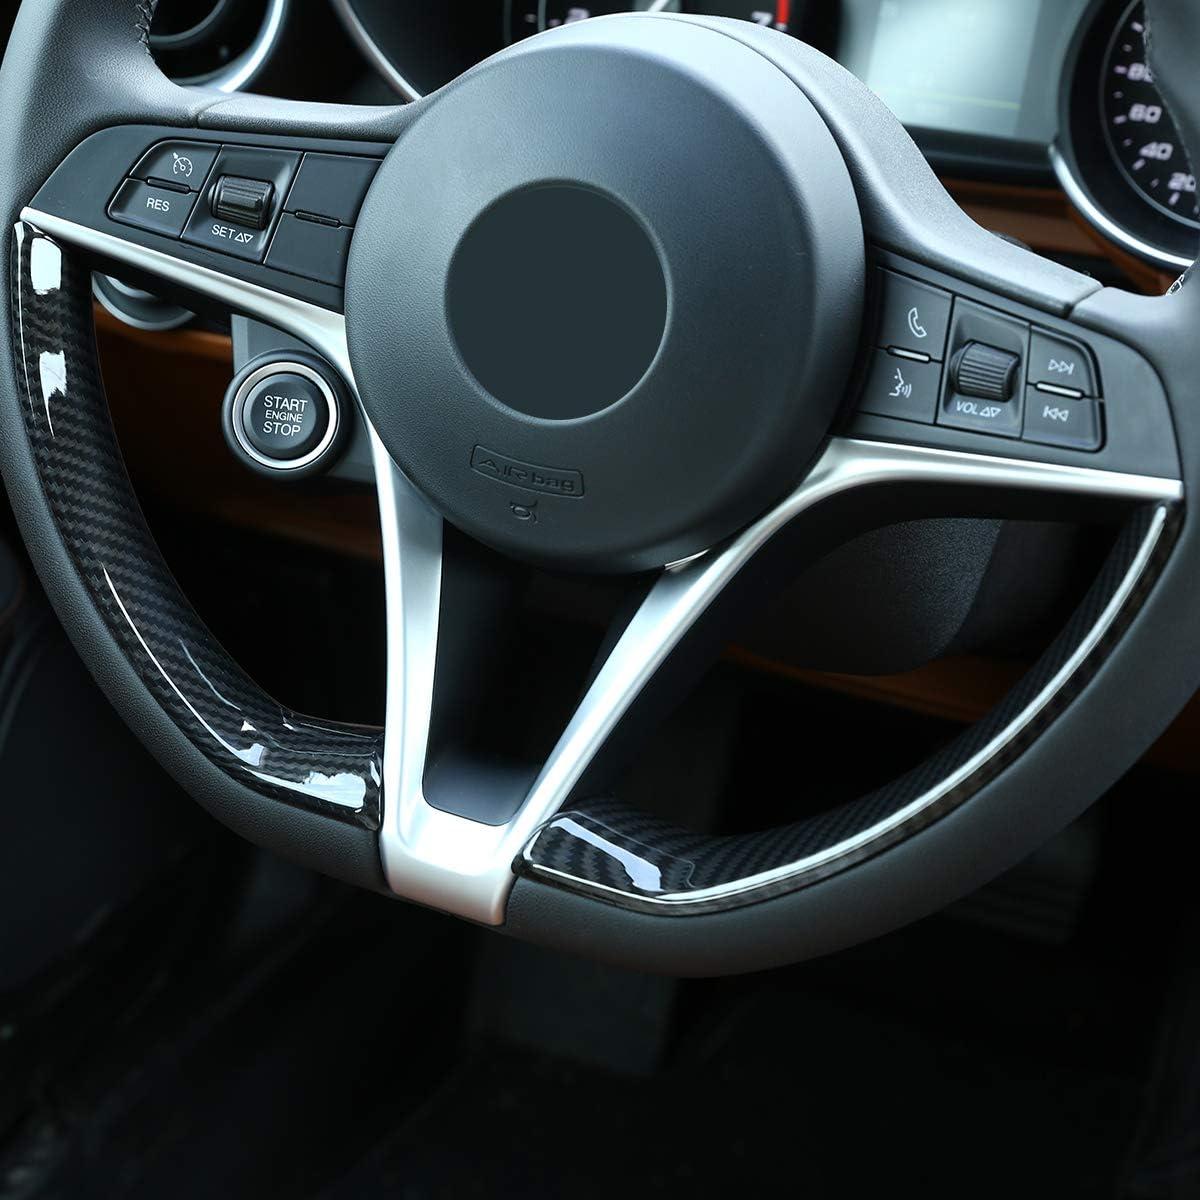 LLKUANG ABS Carbon Fiber For Alfa Romeo Giulia Stelvio 2017-2019 Steering Wheel Frame